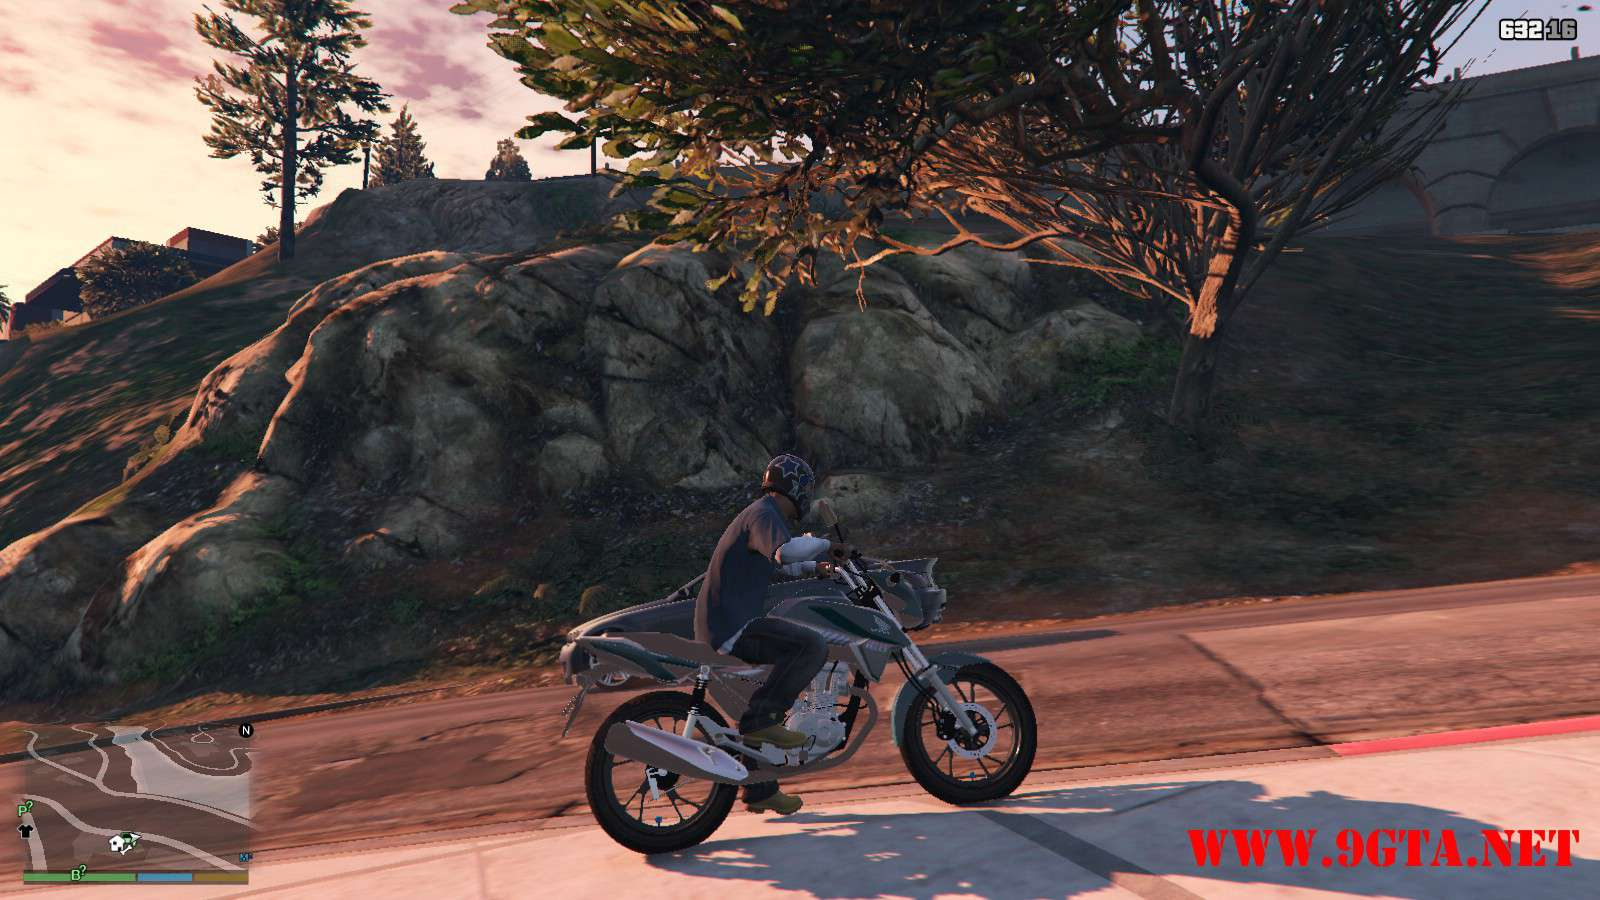 2016 Titan 160 Motocycle GTA5 Mods (4)